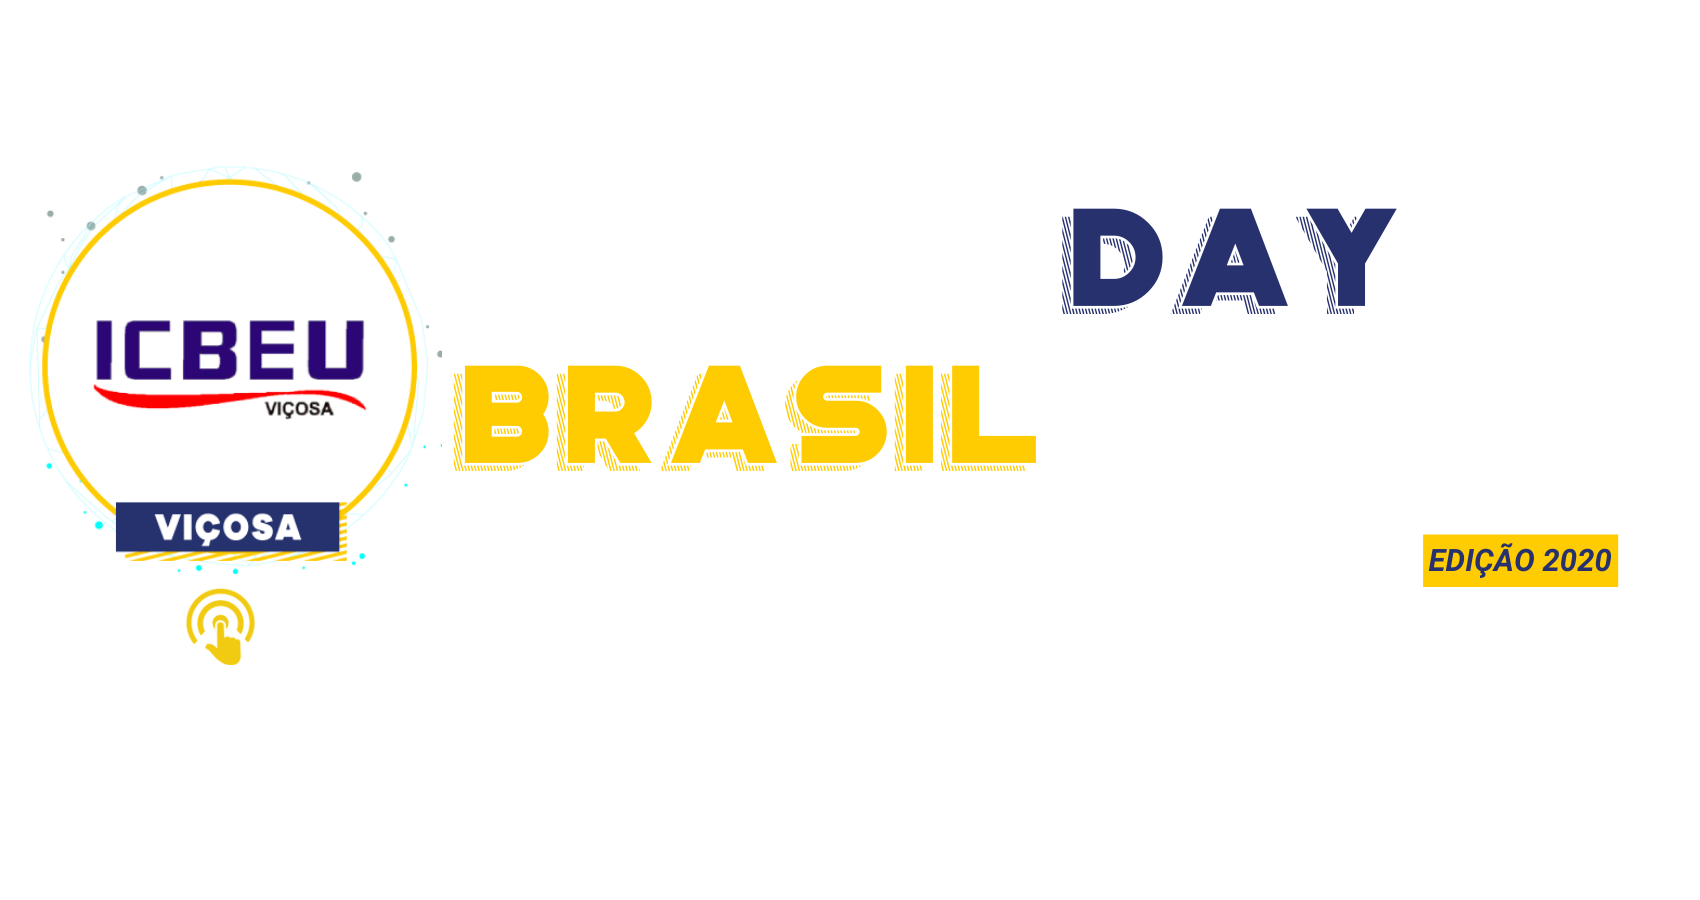 Maker Day Brasil Capa Viçosa